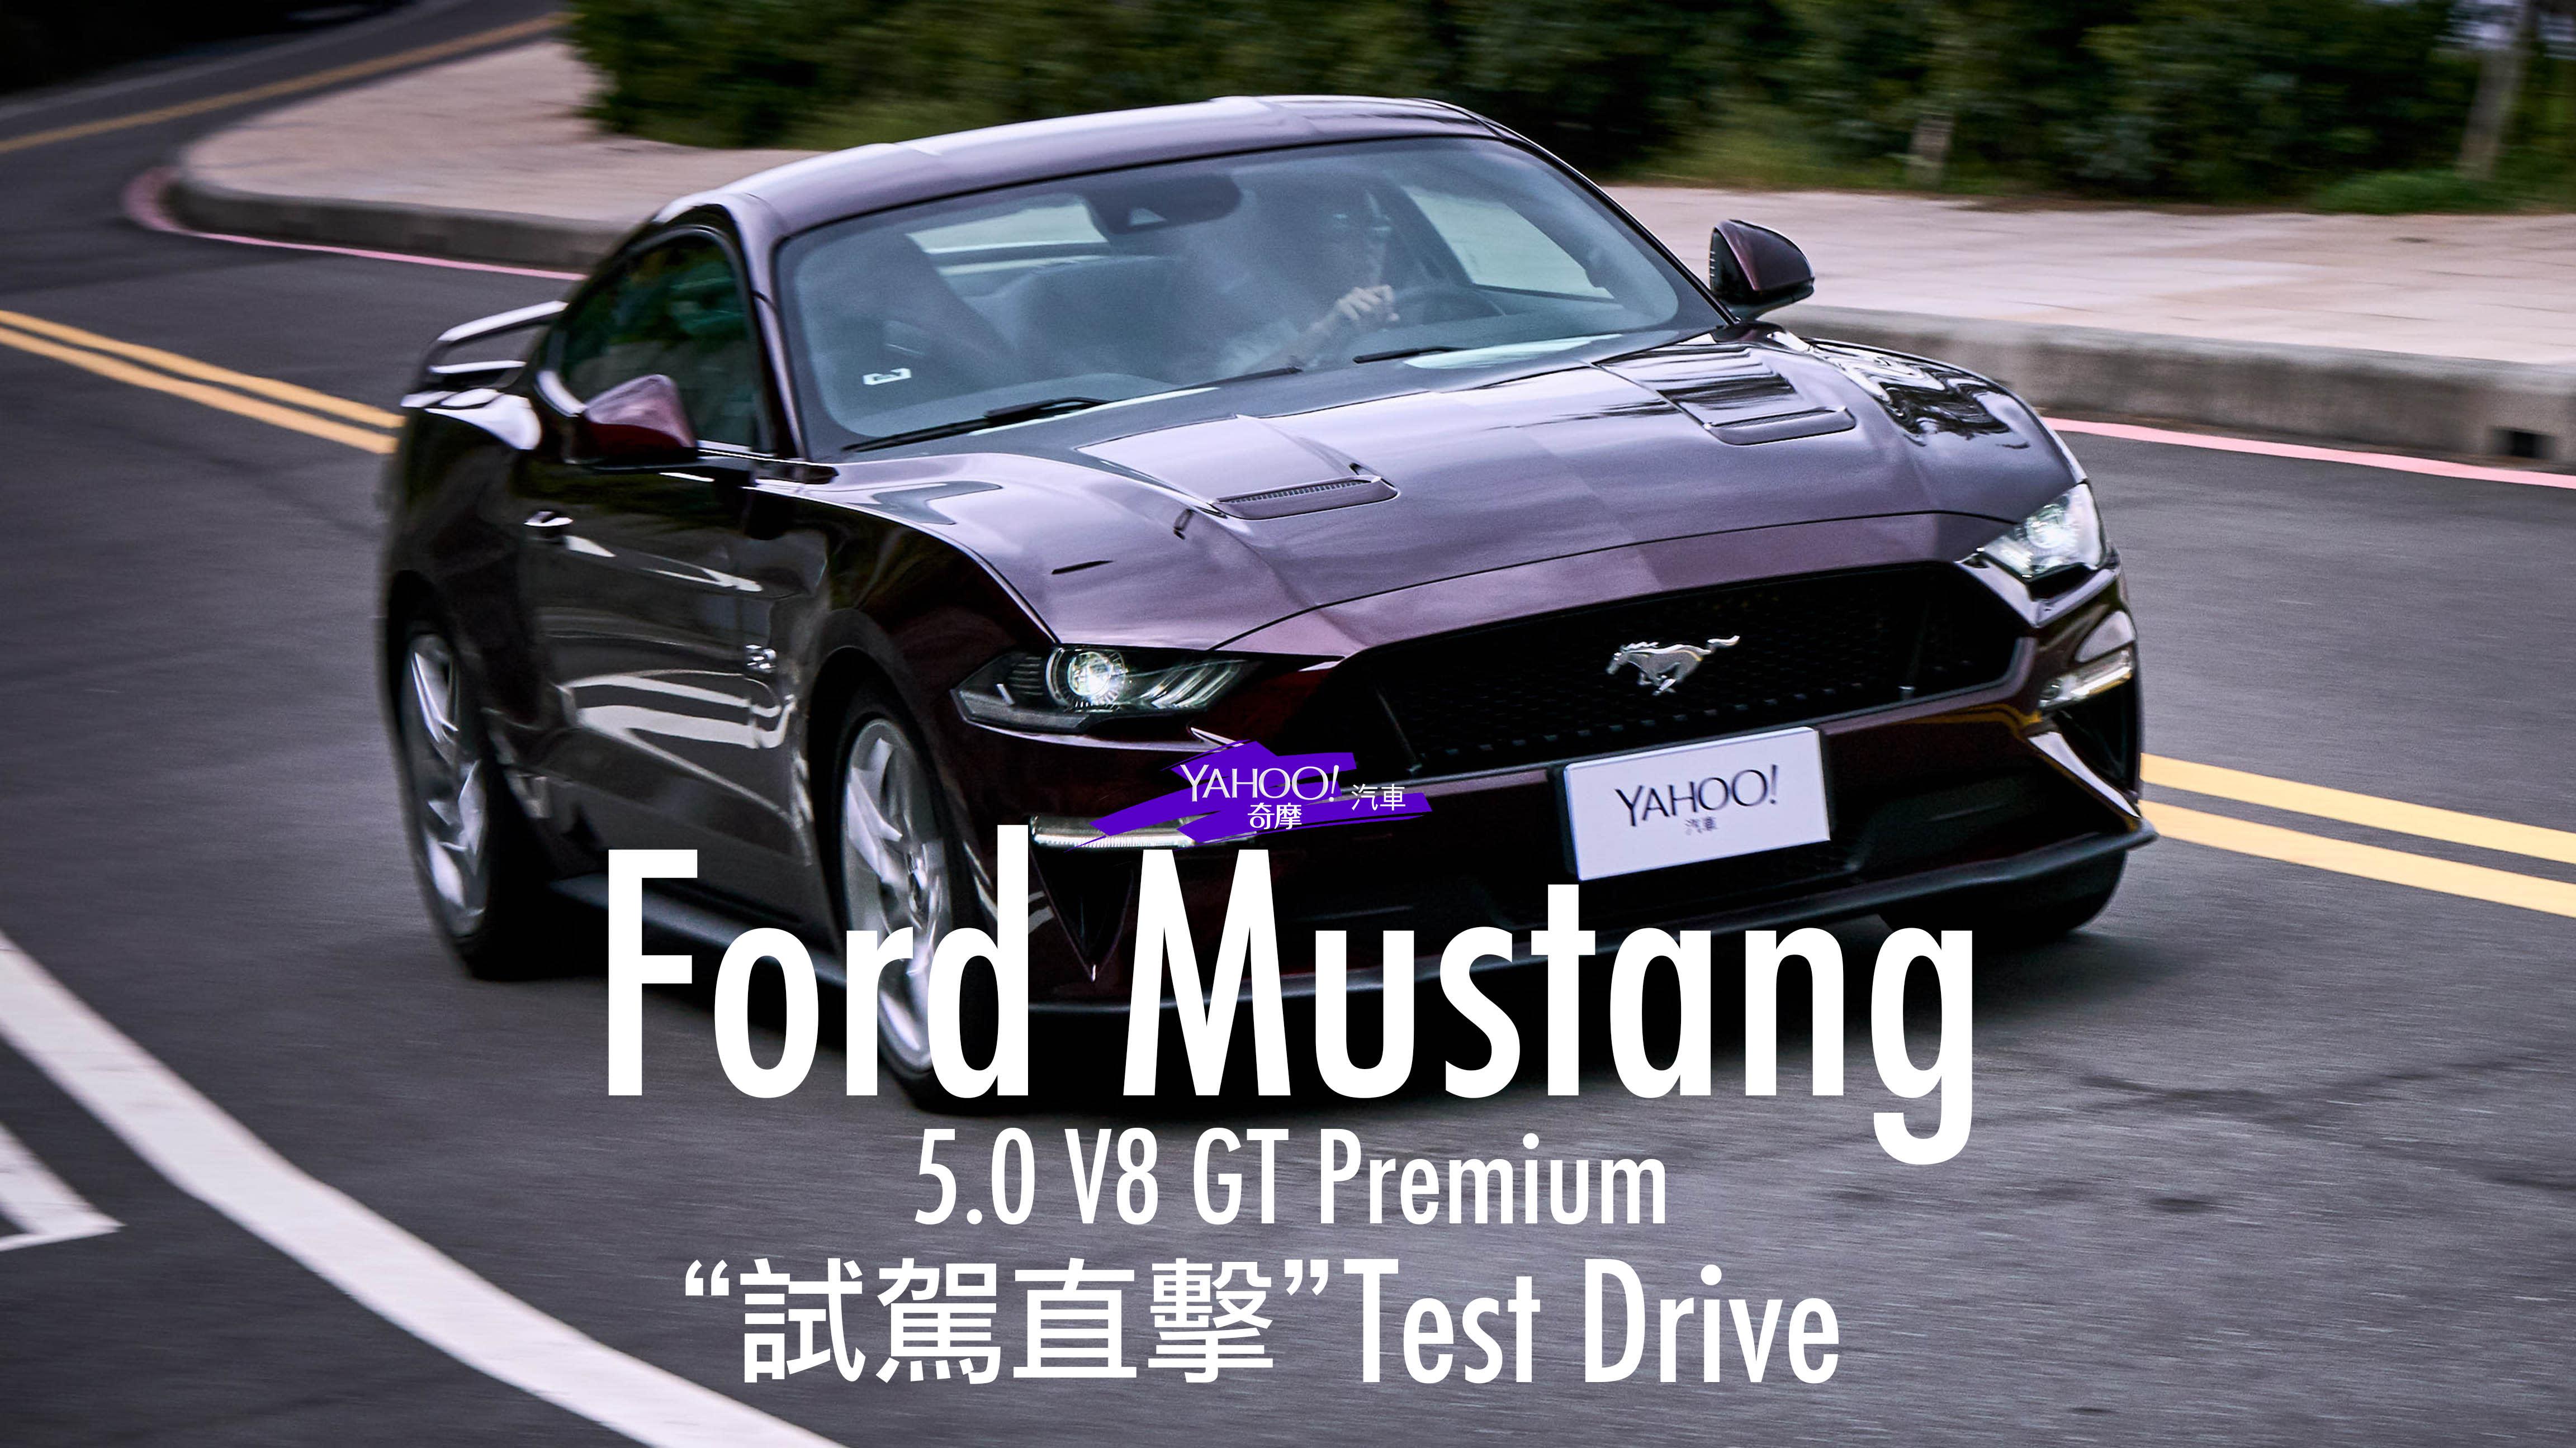 【試駕直擊】更兇、更快、更帶勁!2018 Ford「野馬」Mustang 5.0 GT灣岸試駕